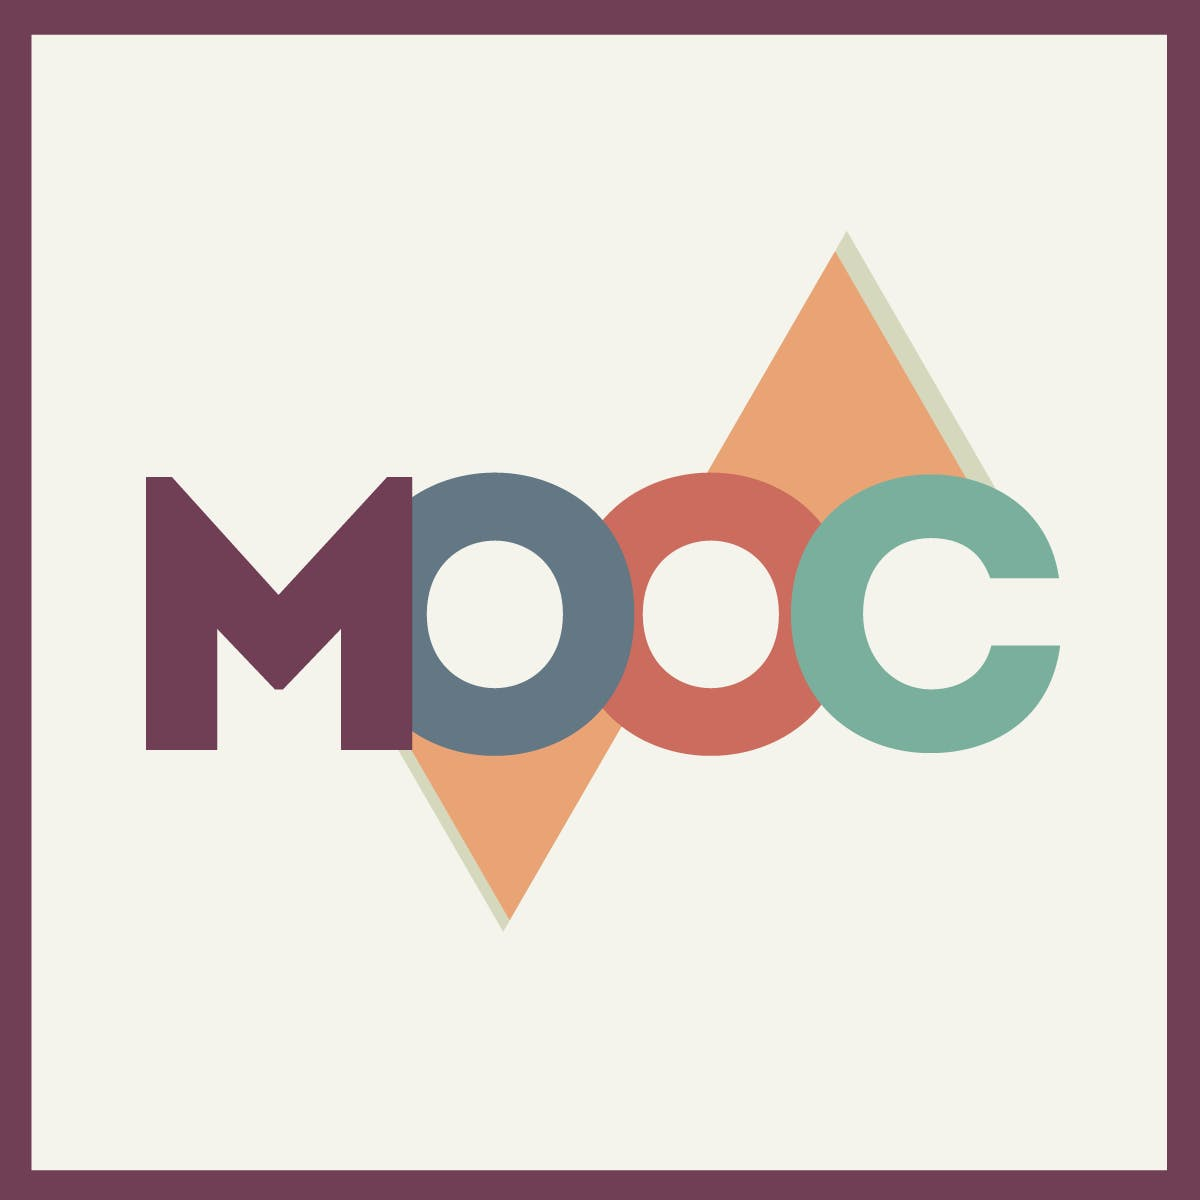 MOOC: How to make a MOOC?